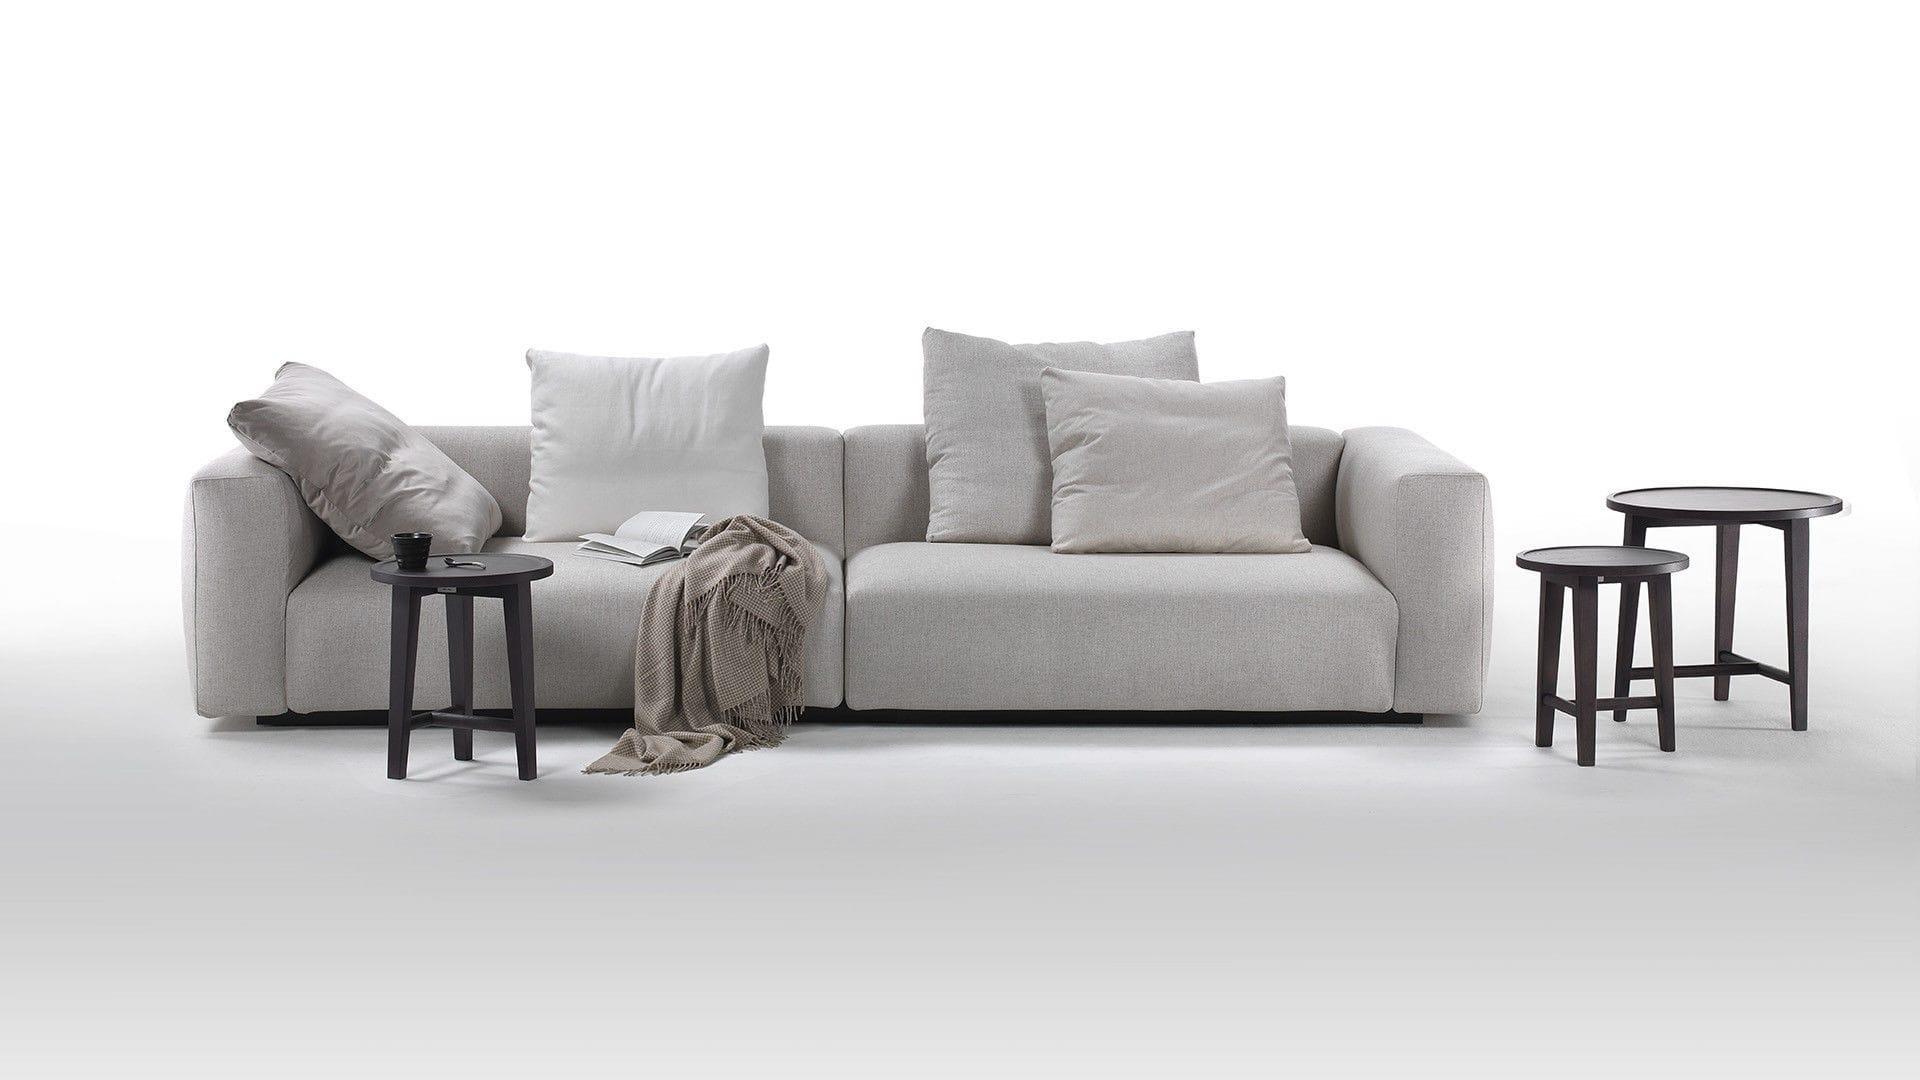 Modular sofa contemporary leather fabric LARIO